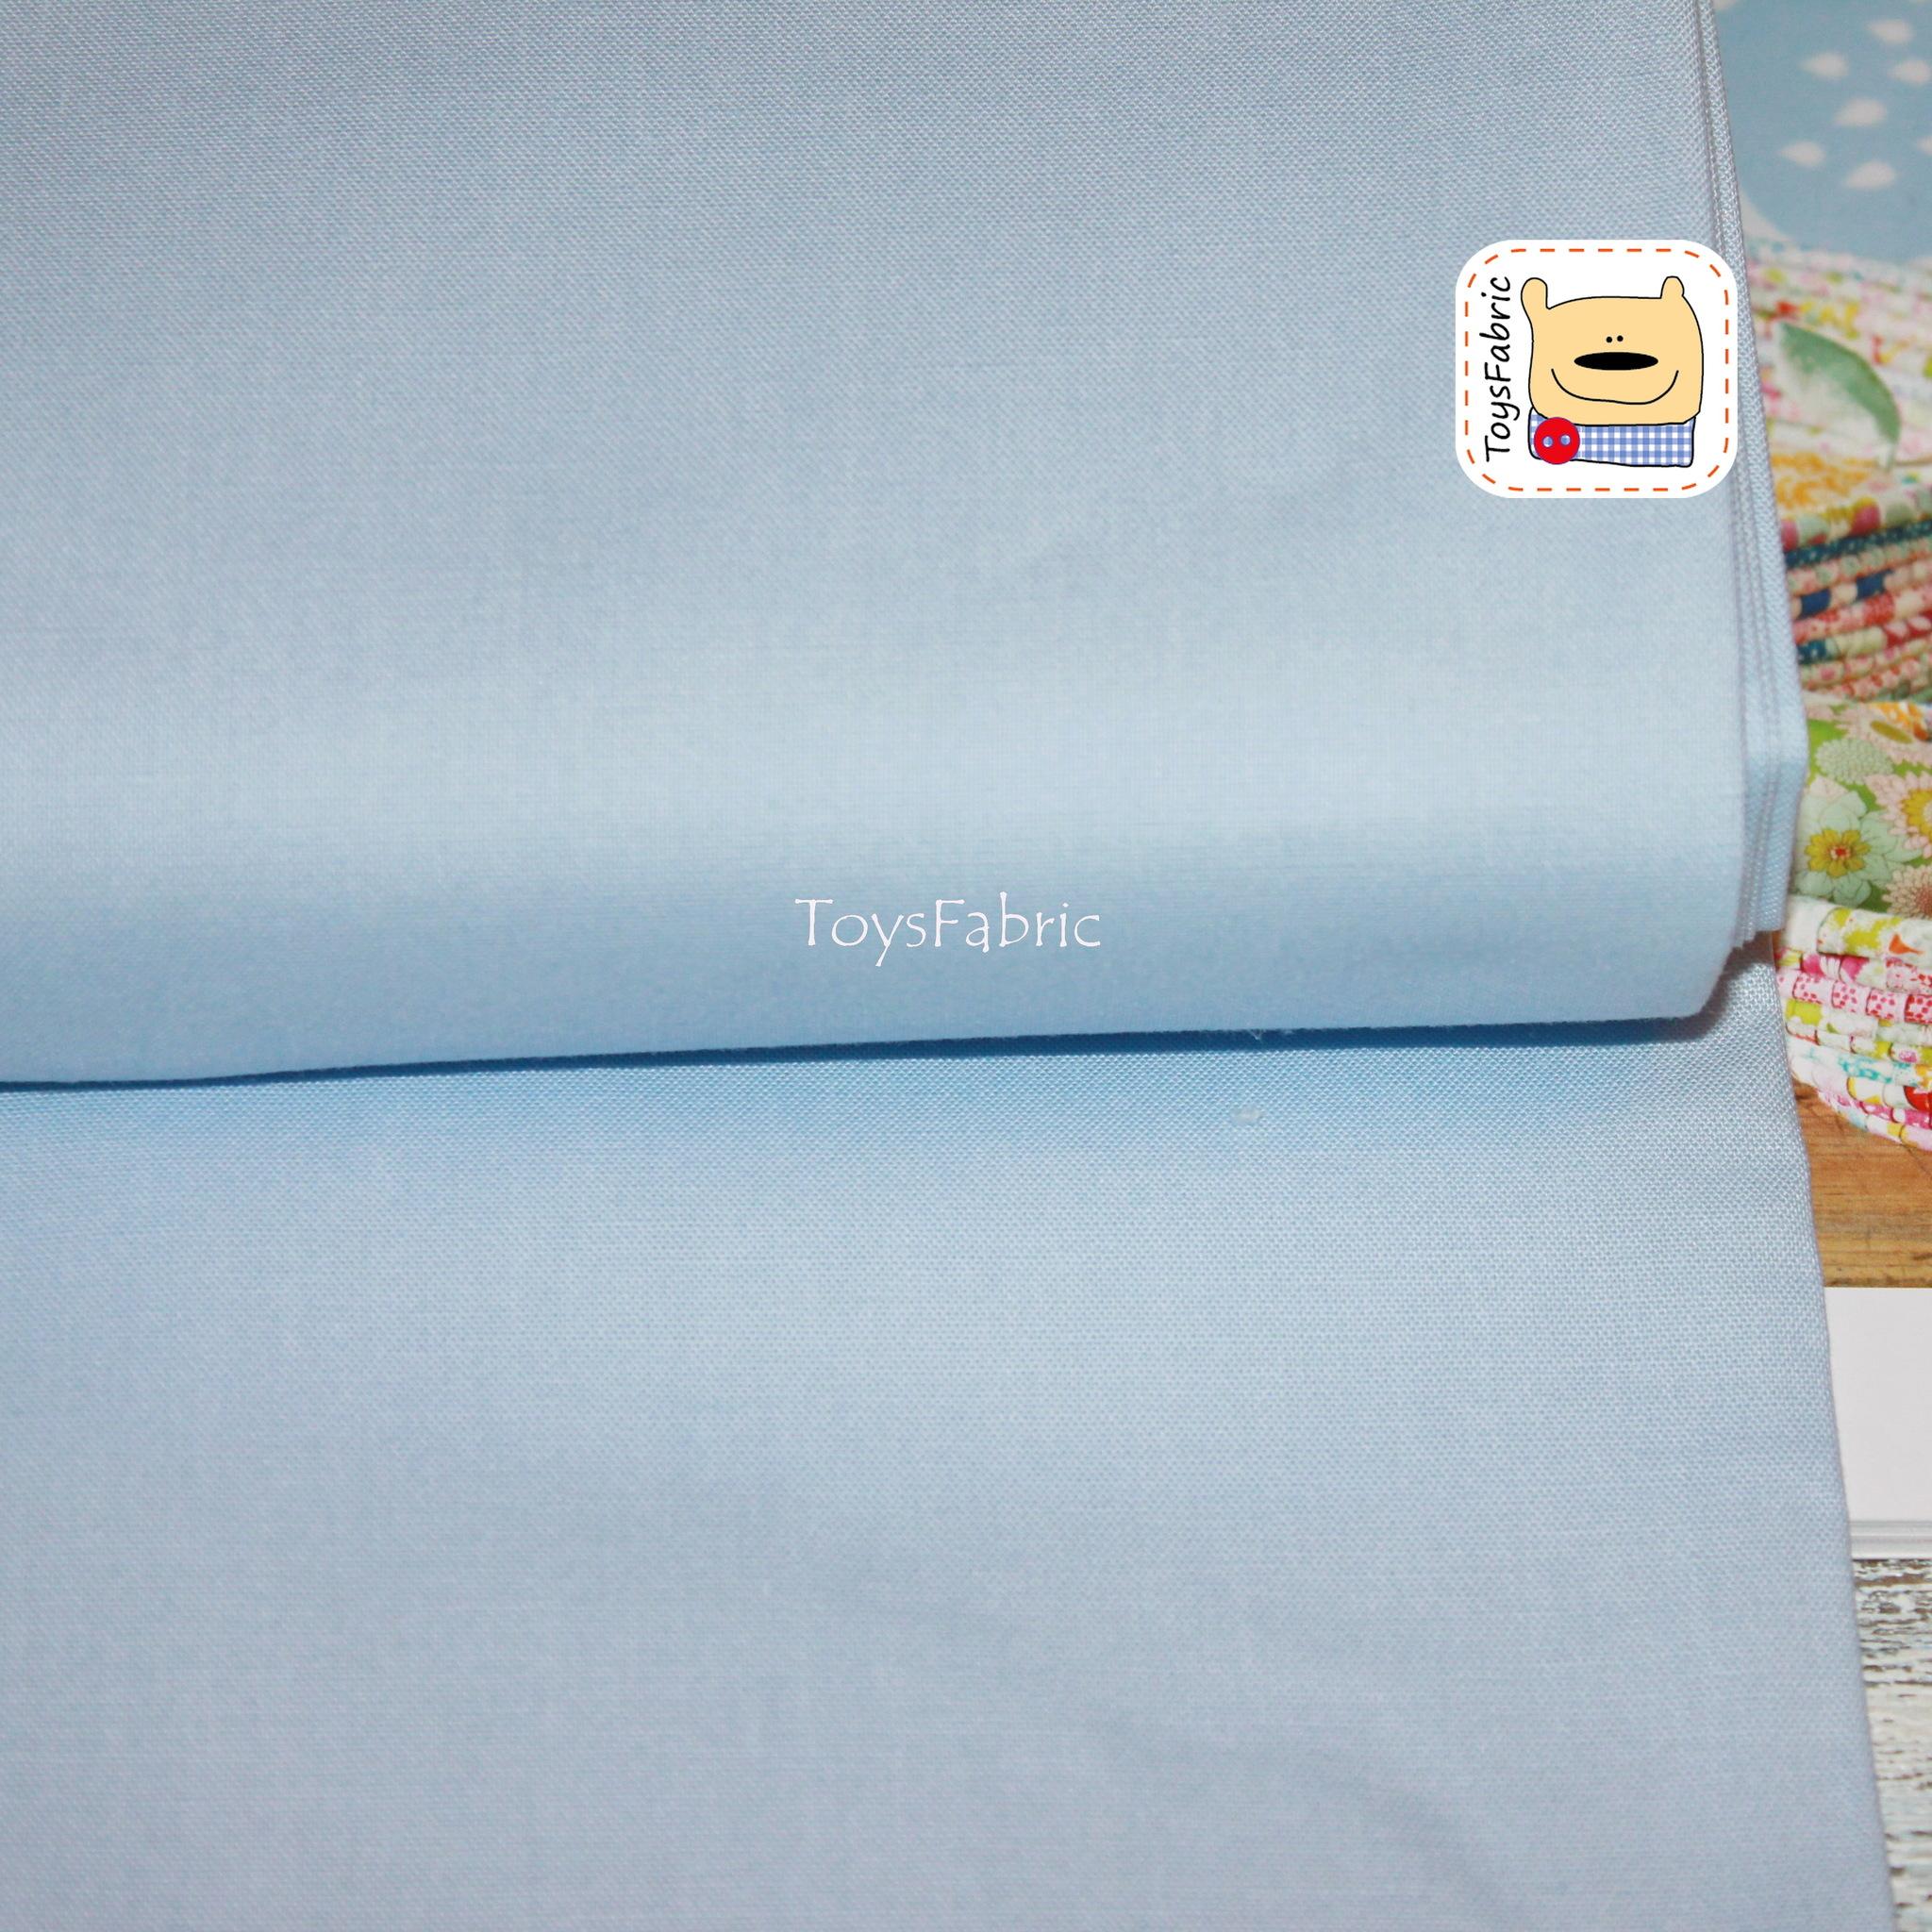 Ткань для пэчворка 20821 корейский хлопок (однотонный голубой) 45х55см